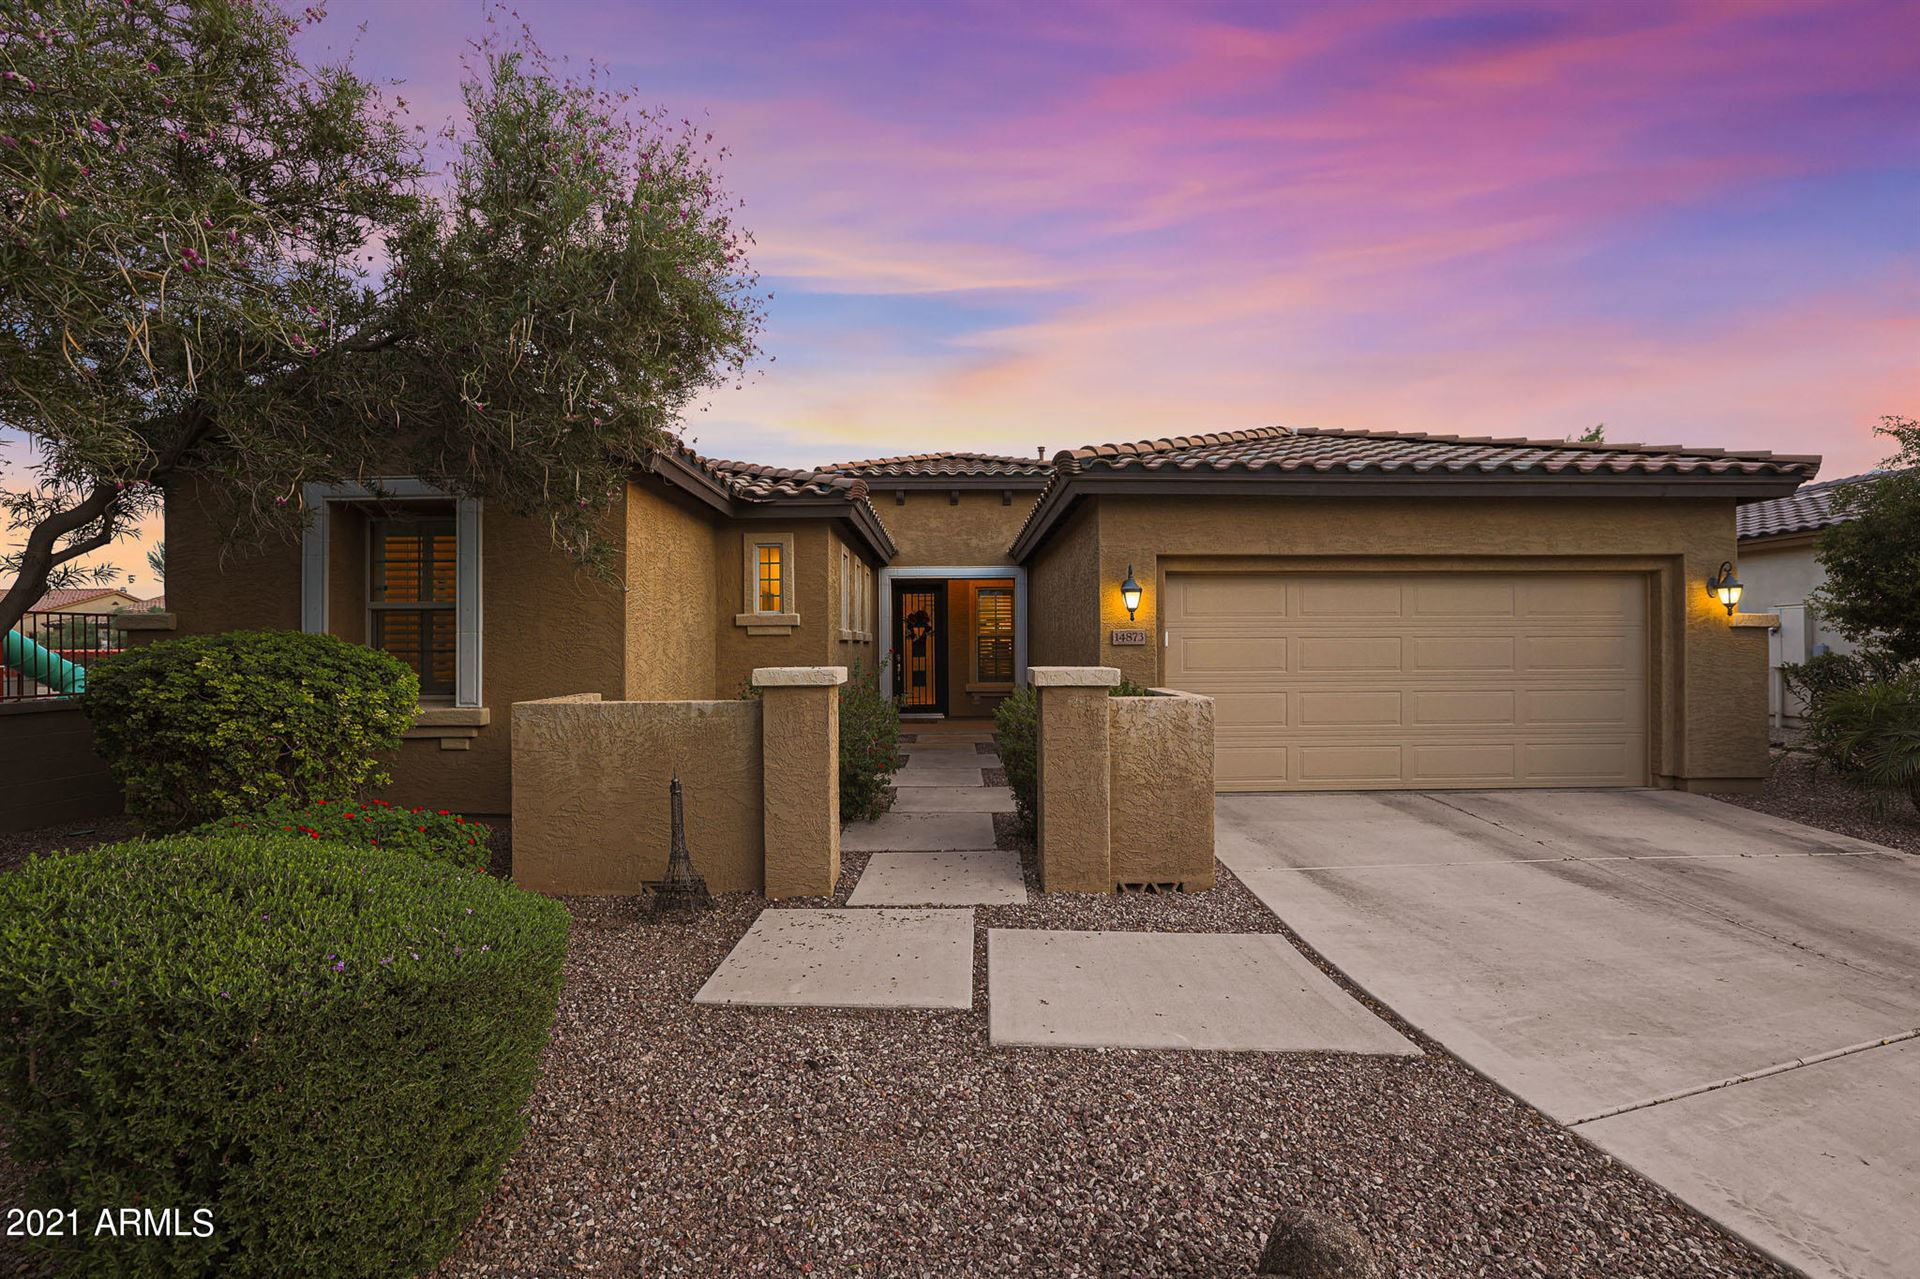 Photo of 14873 W LUNA Circle, Litchfield Park, AZ 85340 (MLS # 6265107)